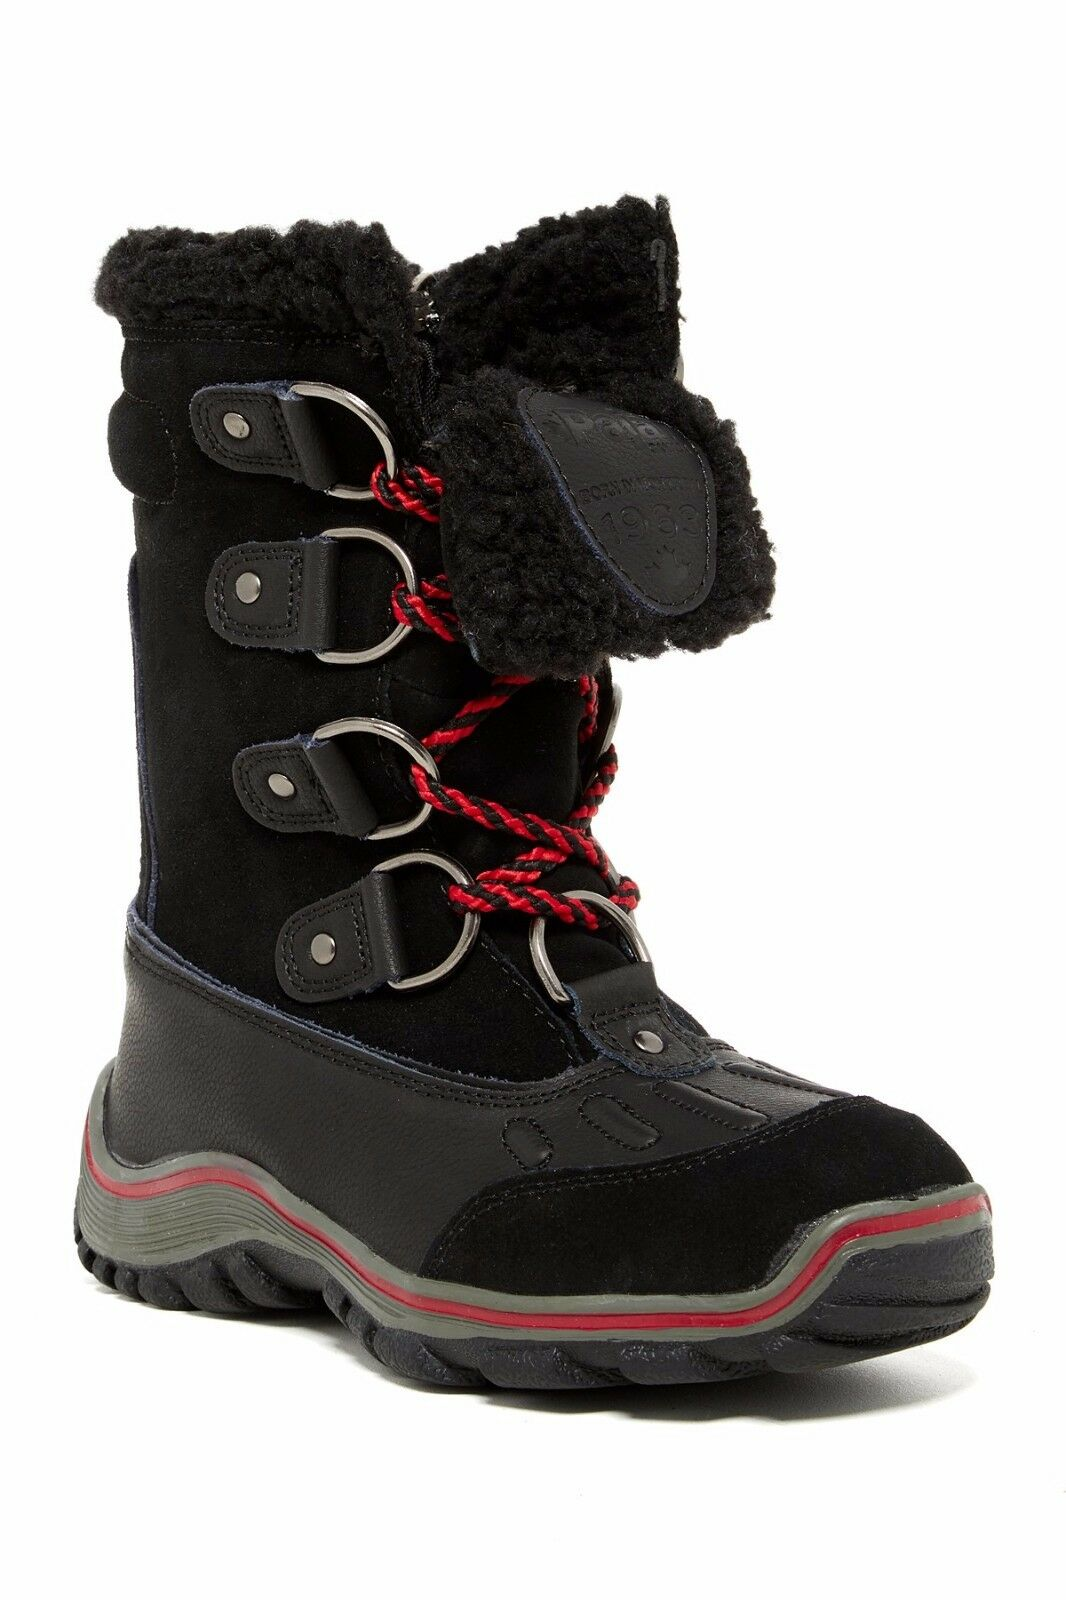 Nuevo pajar Alina Negro Cuero Para Mujer botas De Nieve